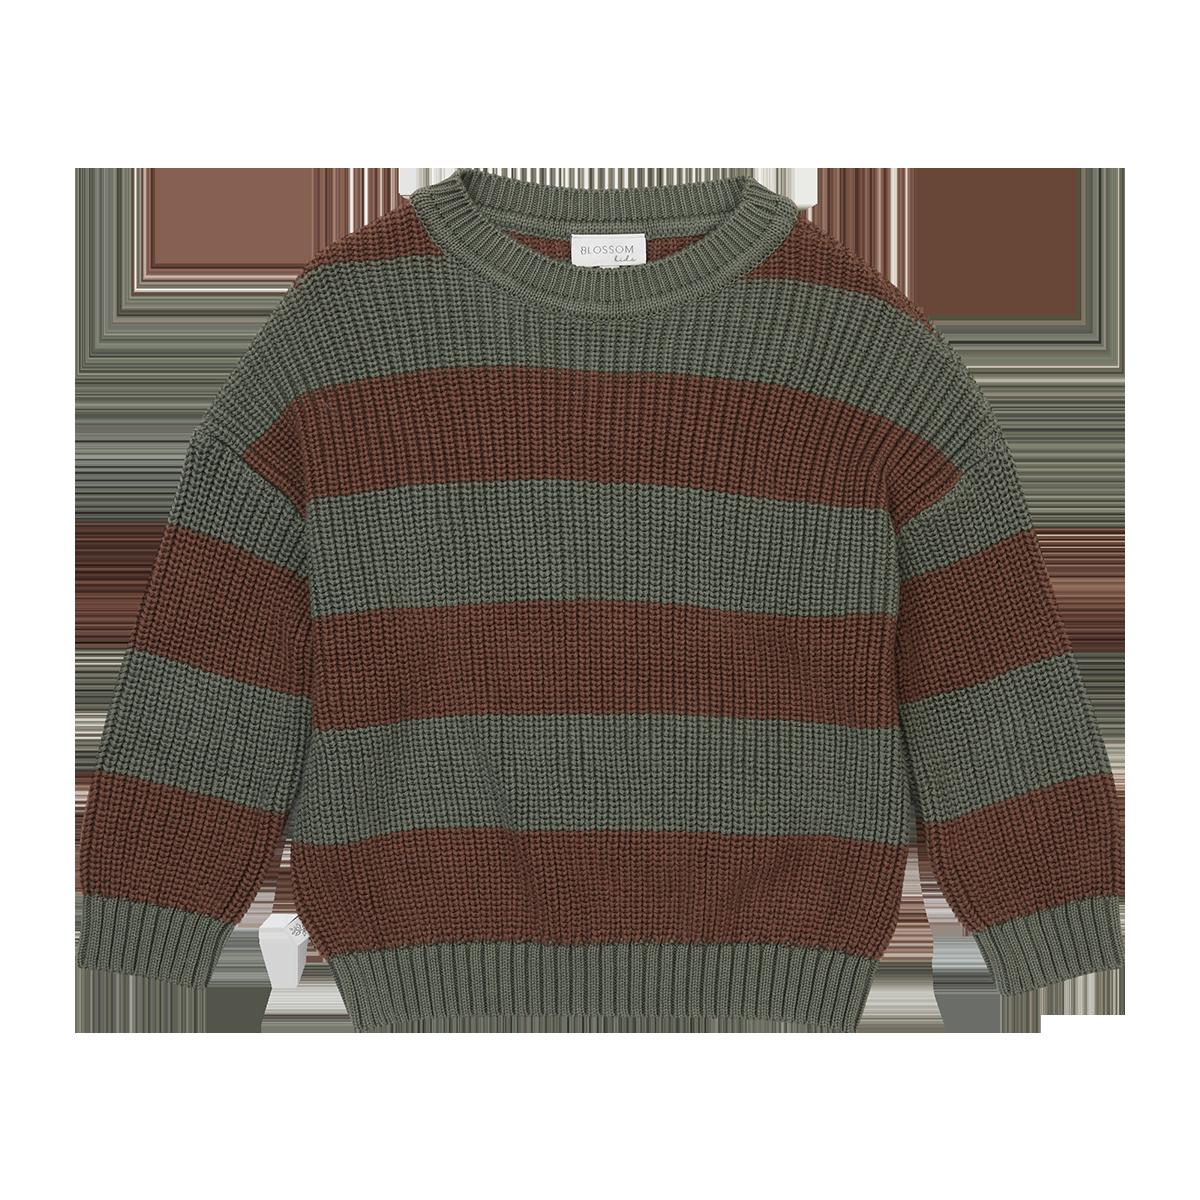 Blossom kids Knitted Jumper - Stripes - Forest Green